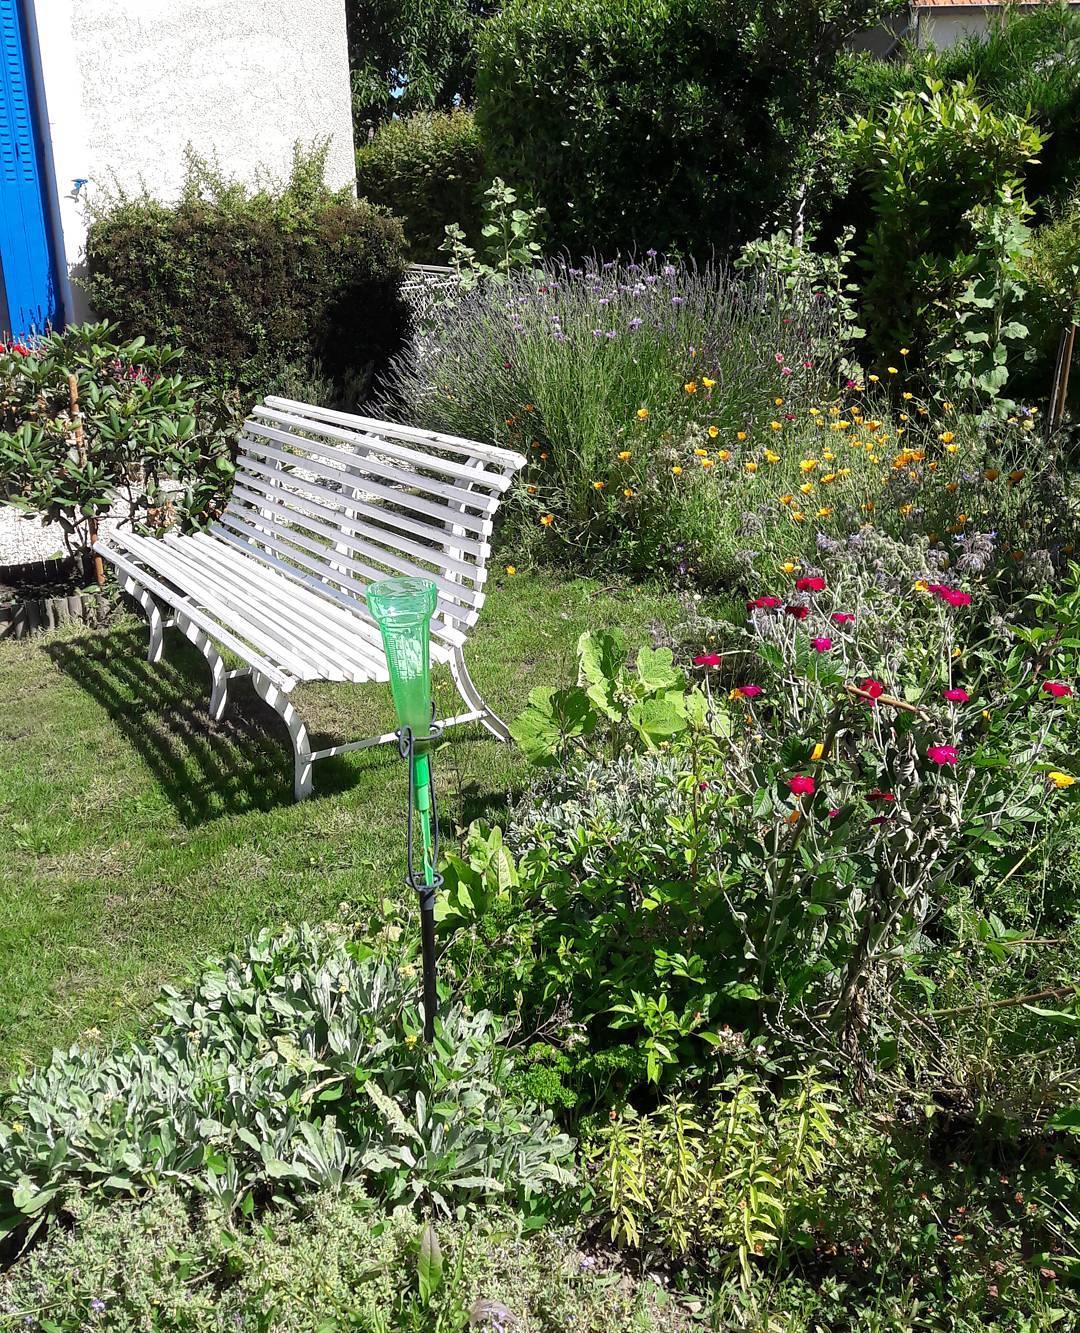 Être mis au banc #jardin #garden #nature #flowers #winter #green #fleurs #instagarden #fleur #detente #relax #repos #bonheur #weekend #zen #instamoment